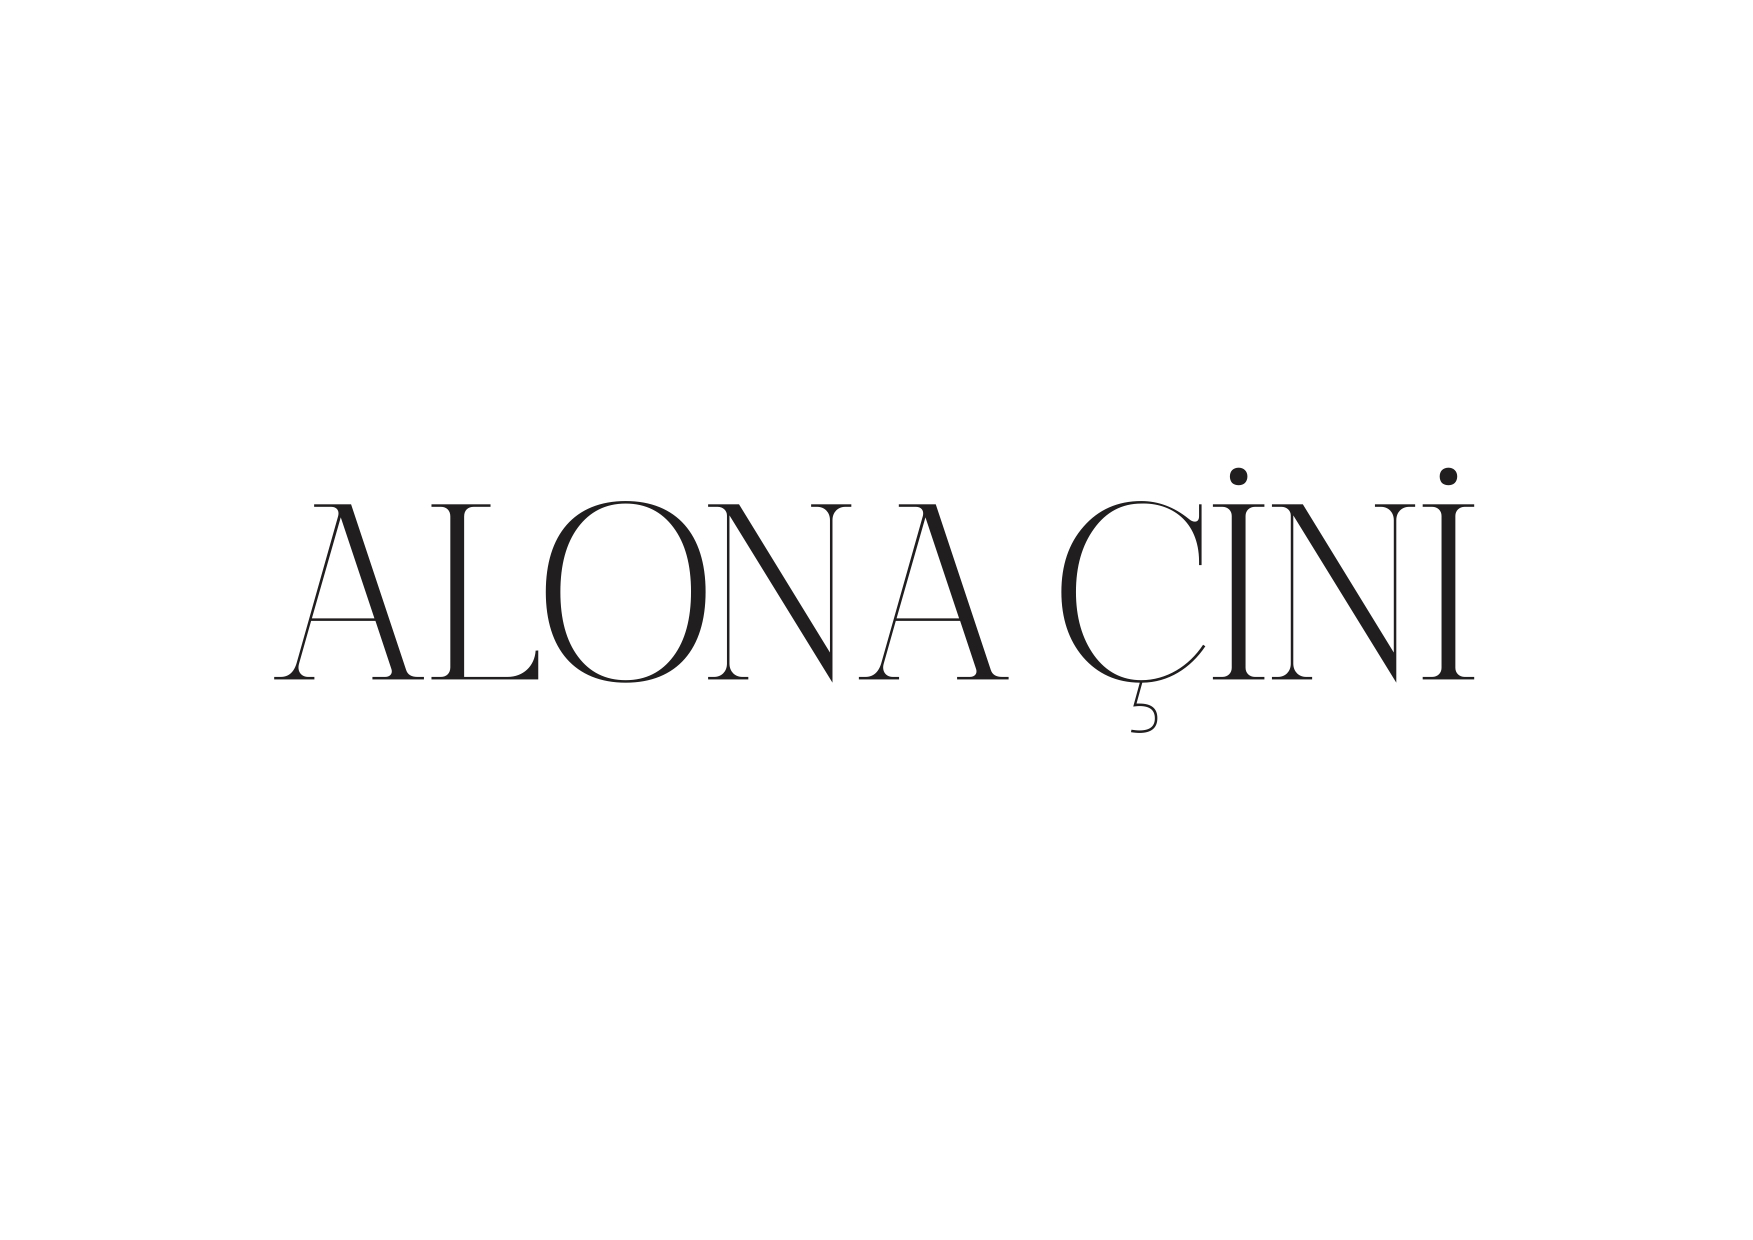 АЛЁНА ЧИНИ (Alona Cini)